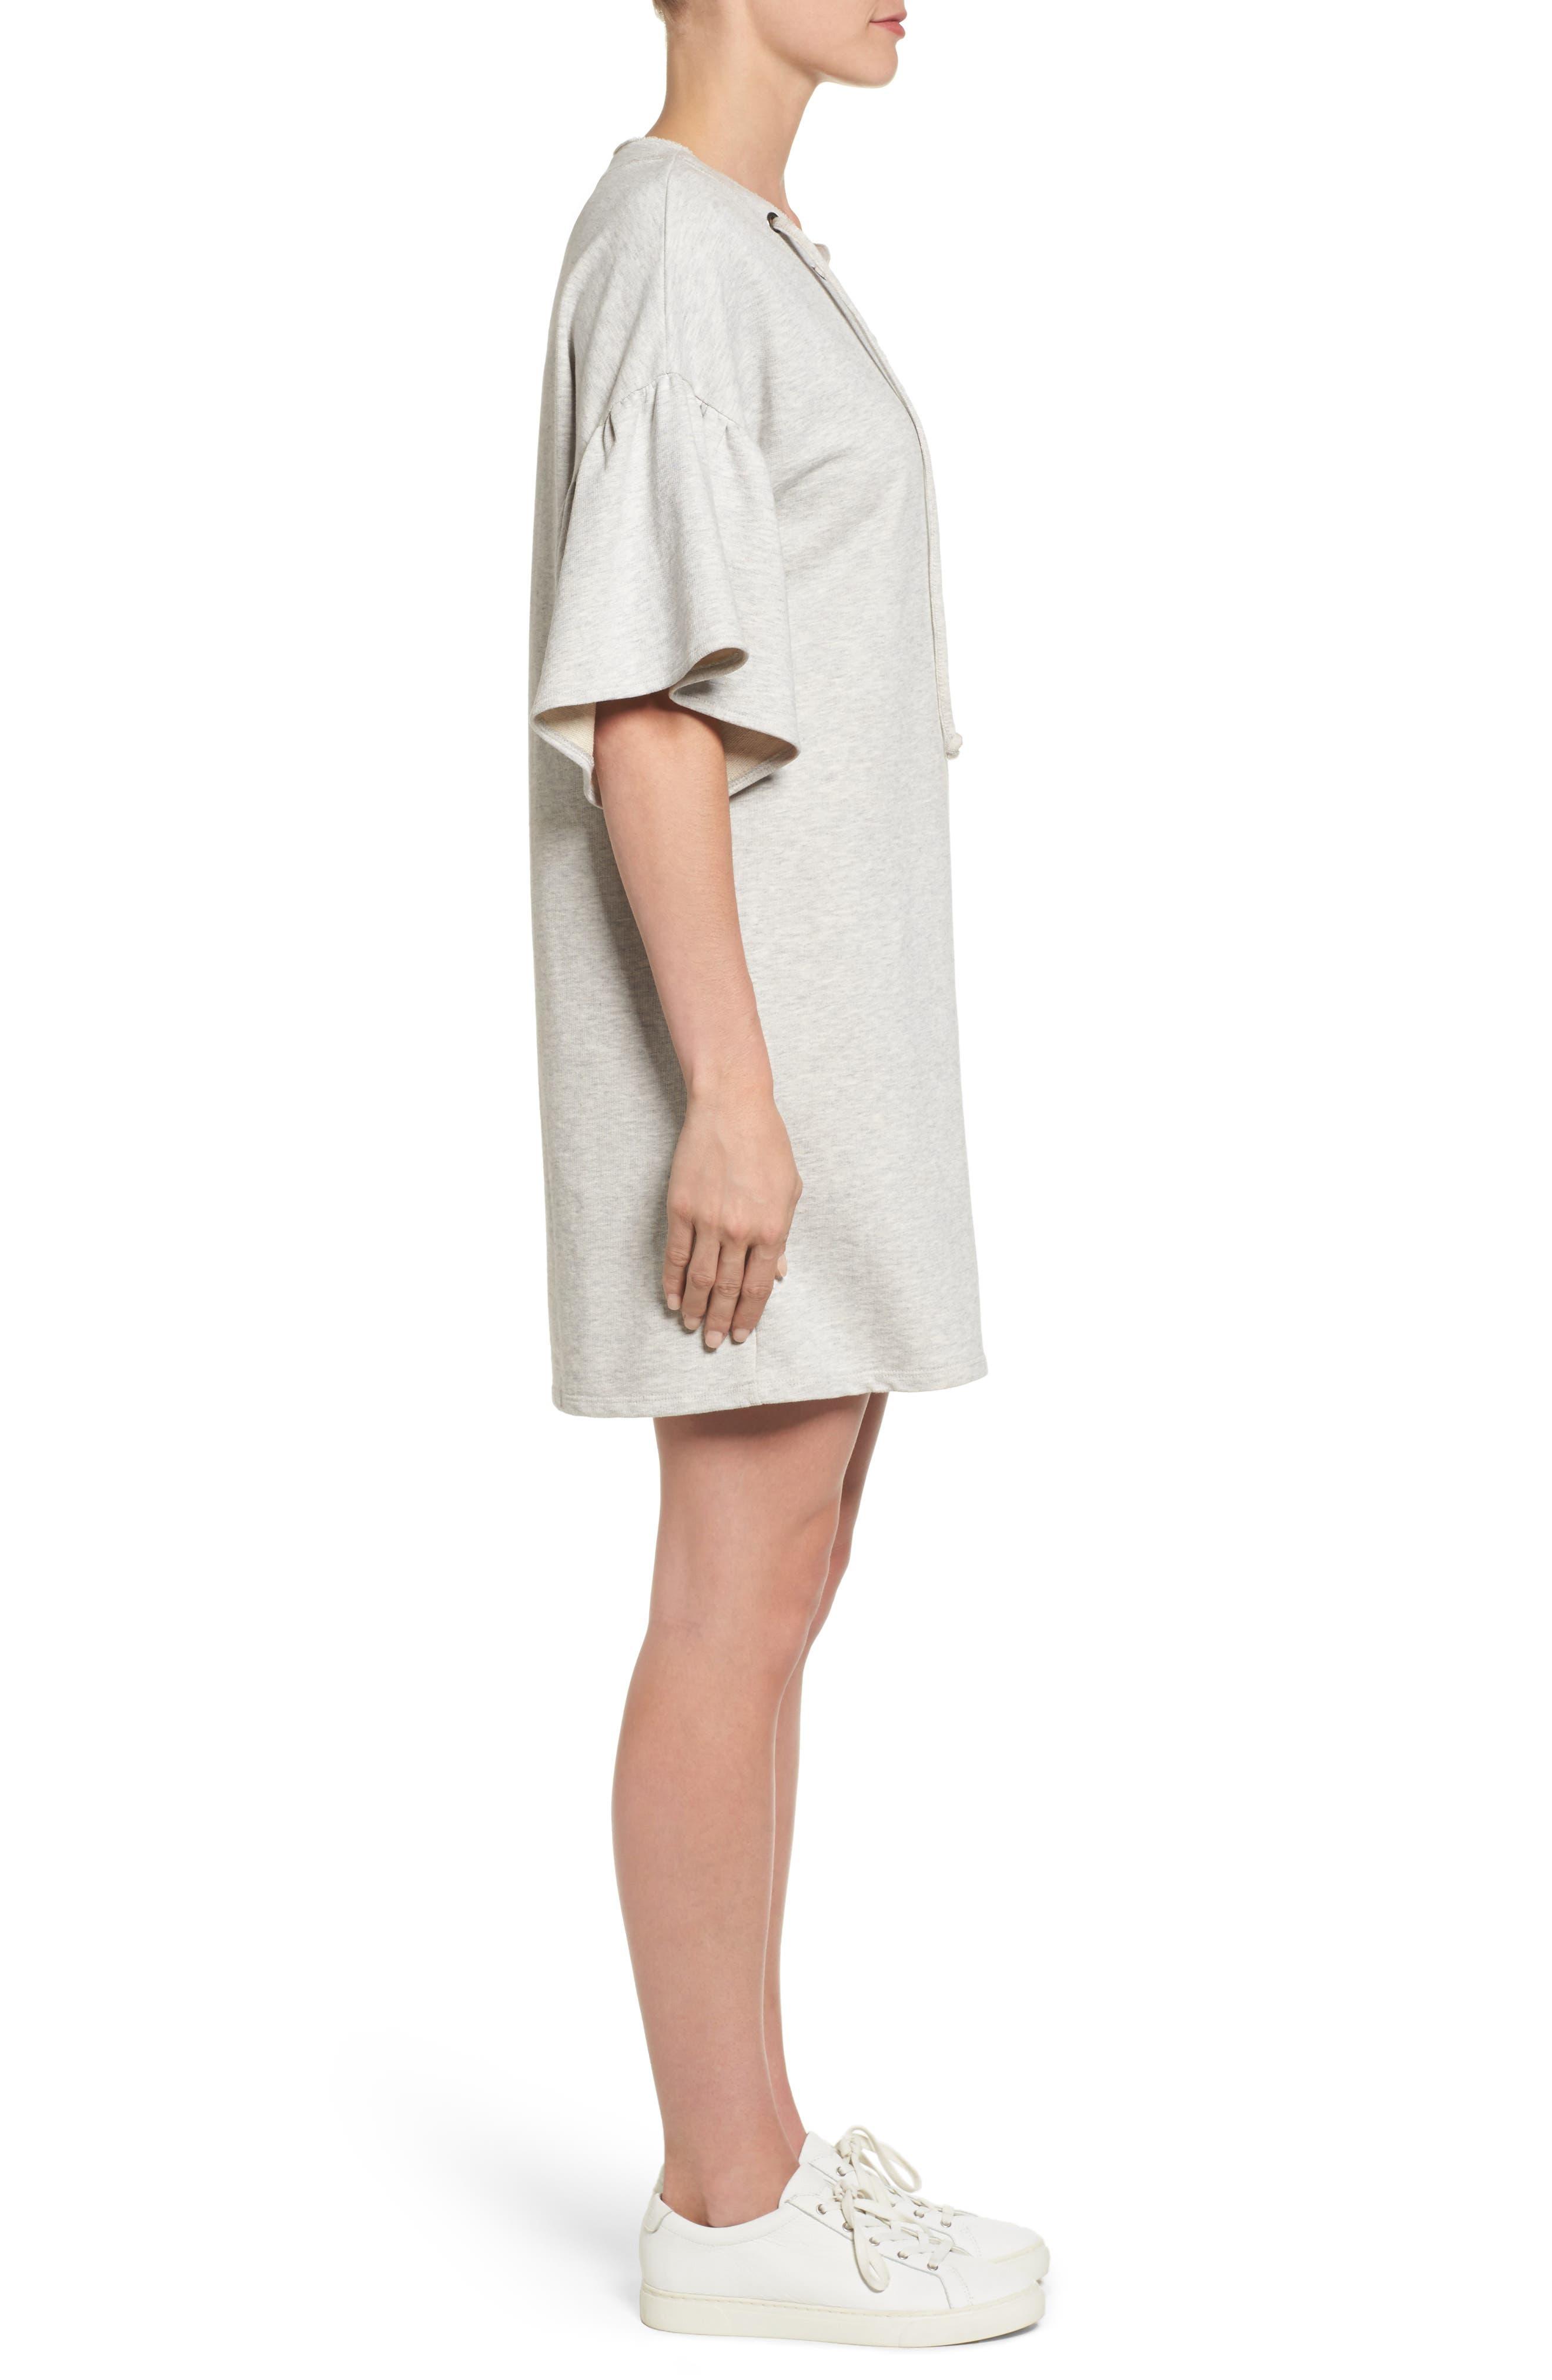 Mariska Fleece Knit Dress,                             Alternate thumbnail 4, color,                             Heather Sterling